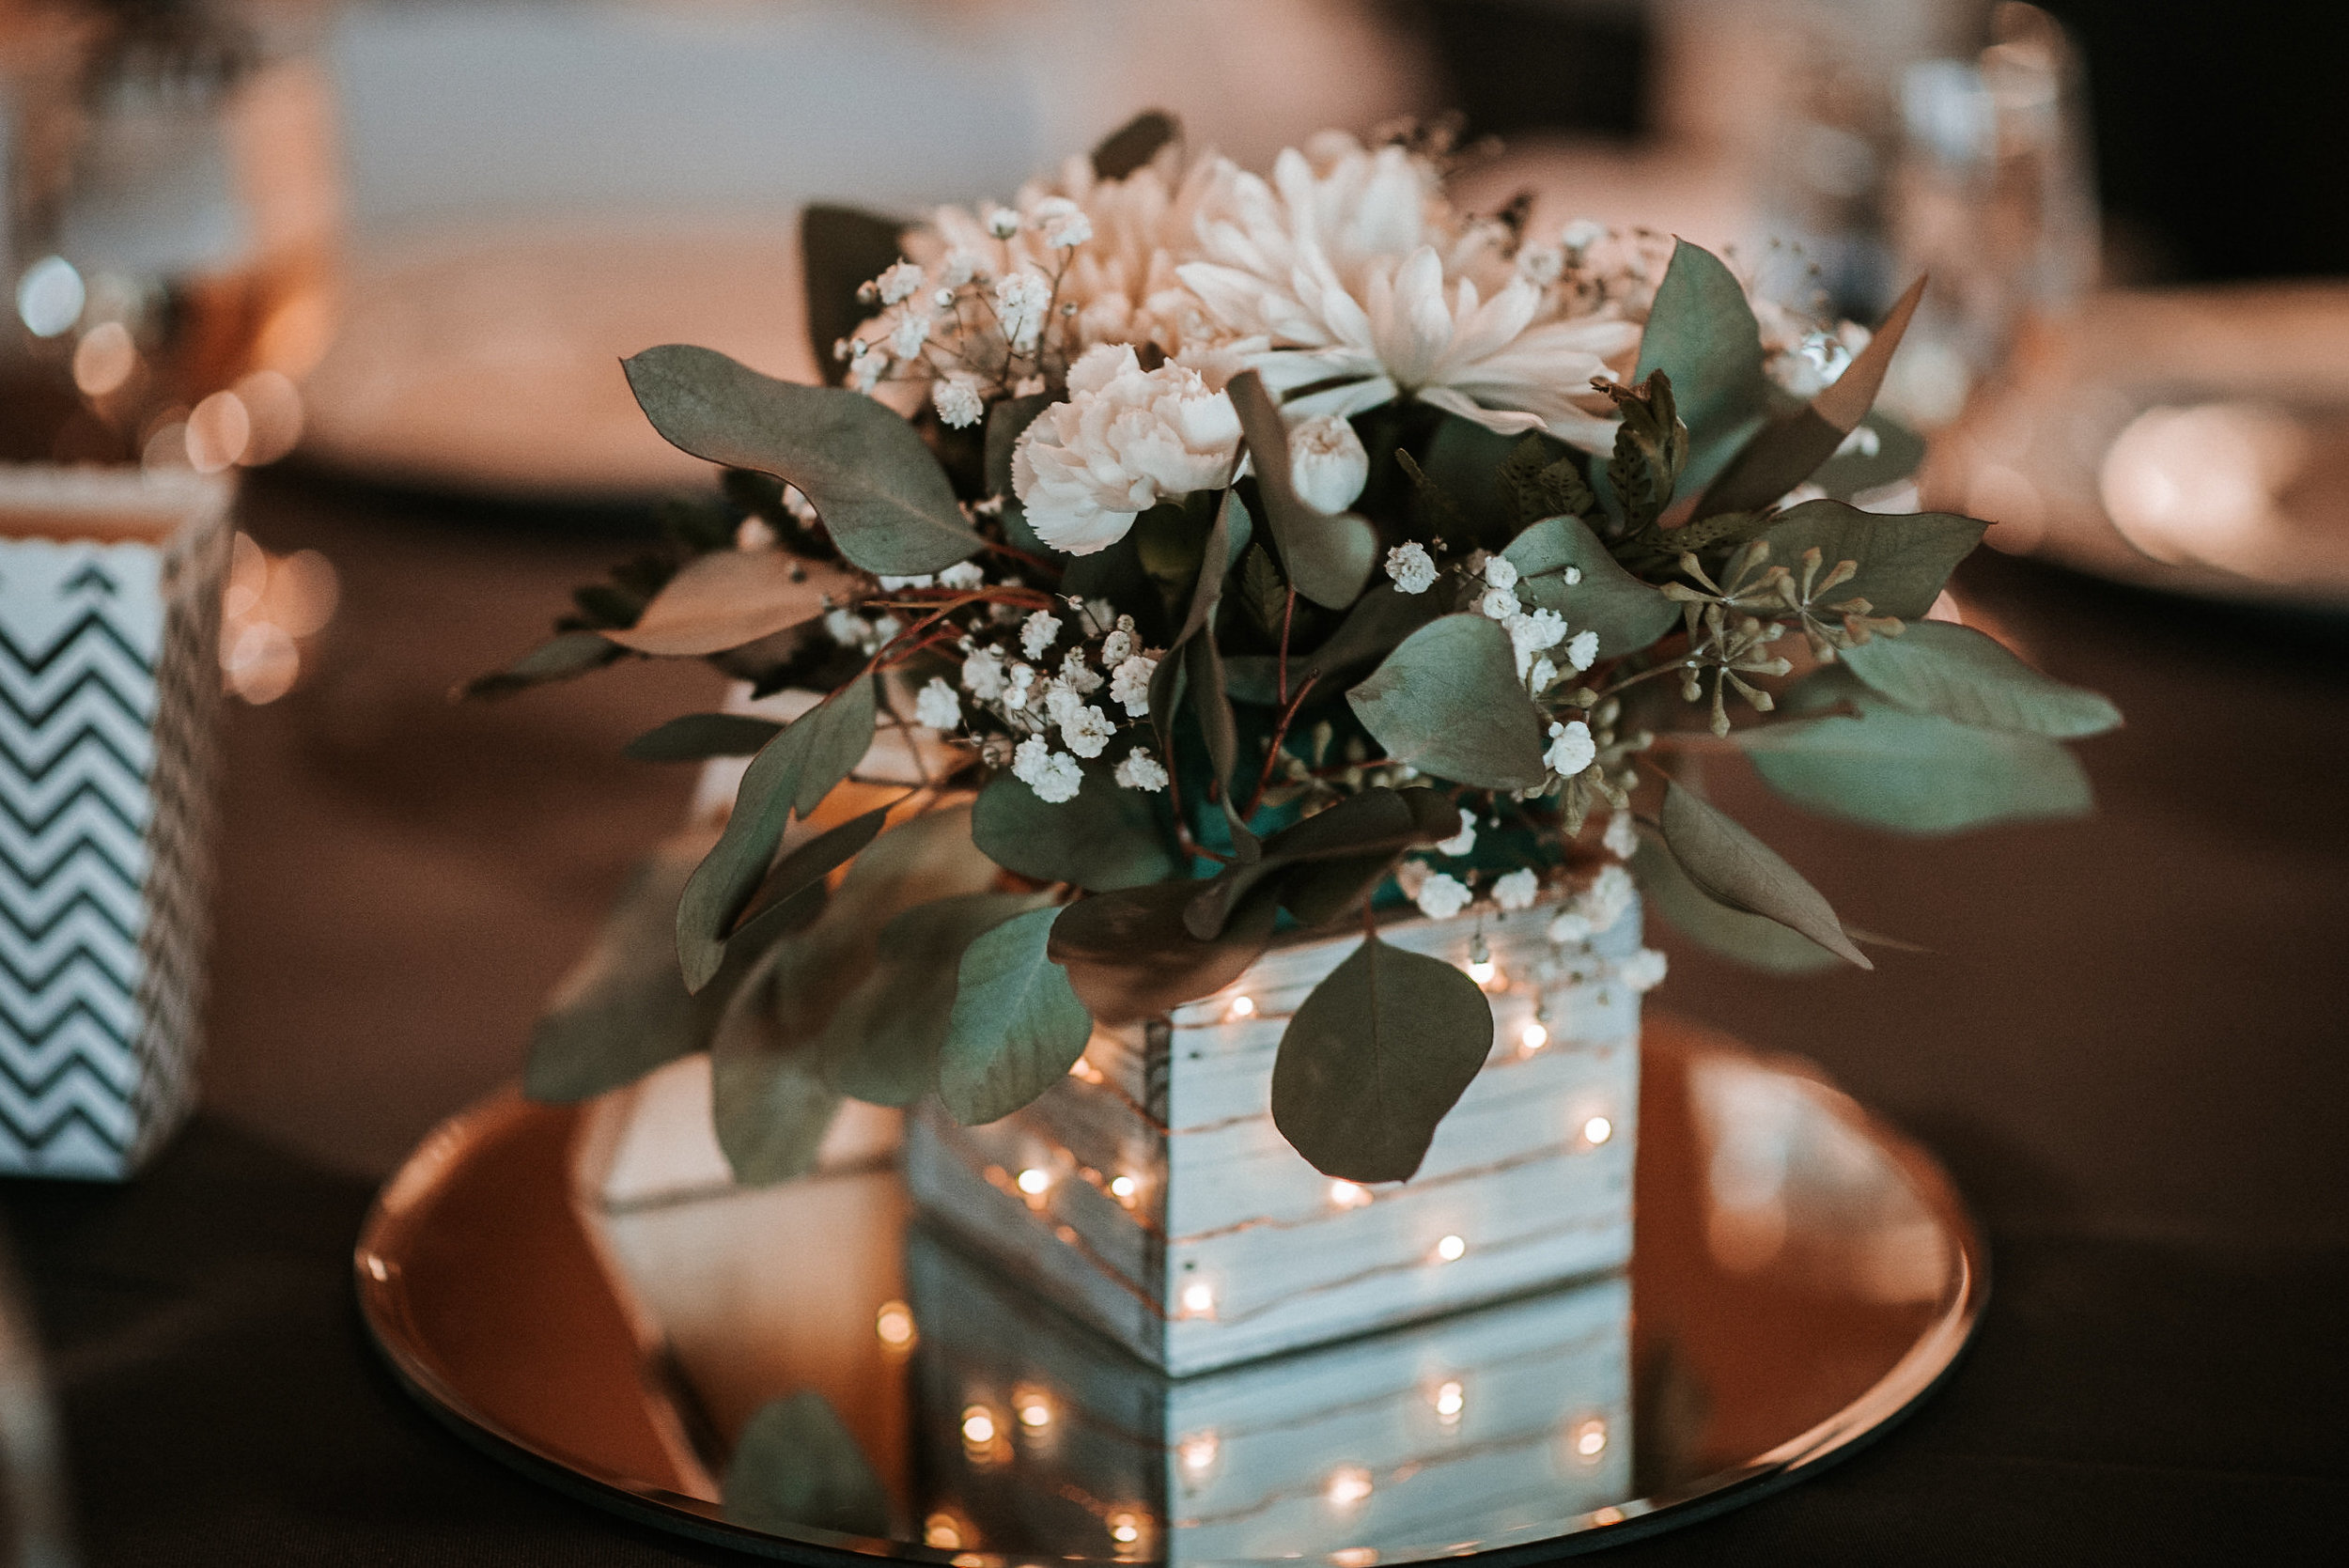 Centerpieces at wedding reception